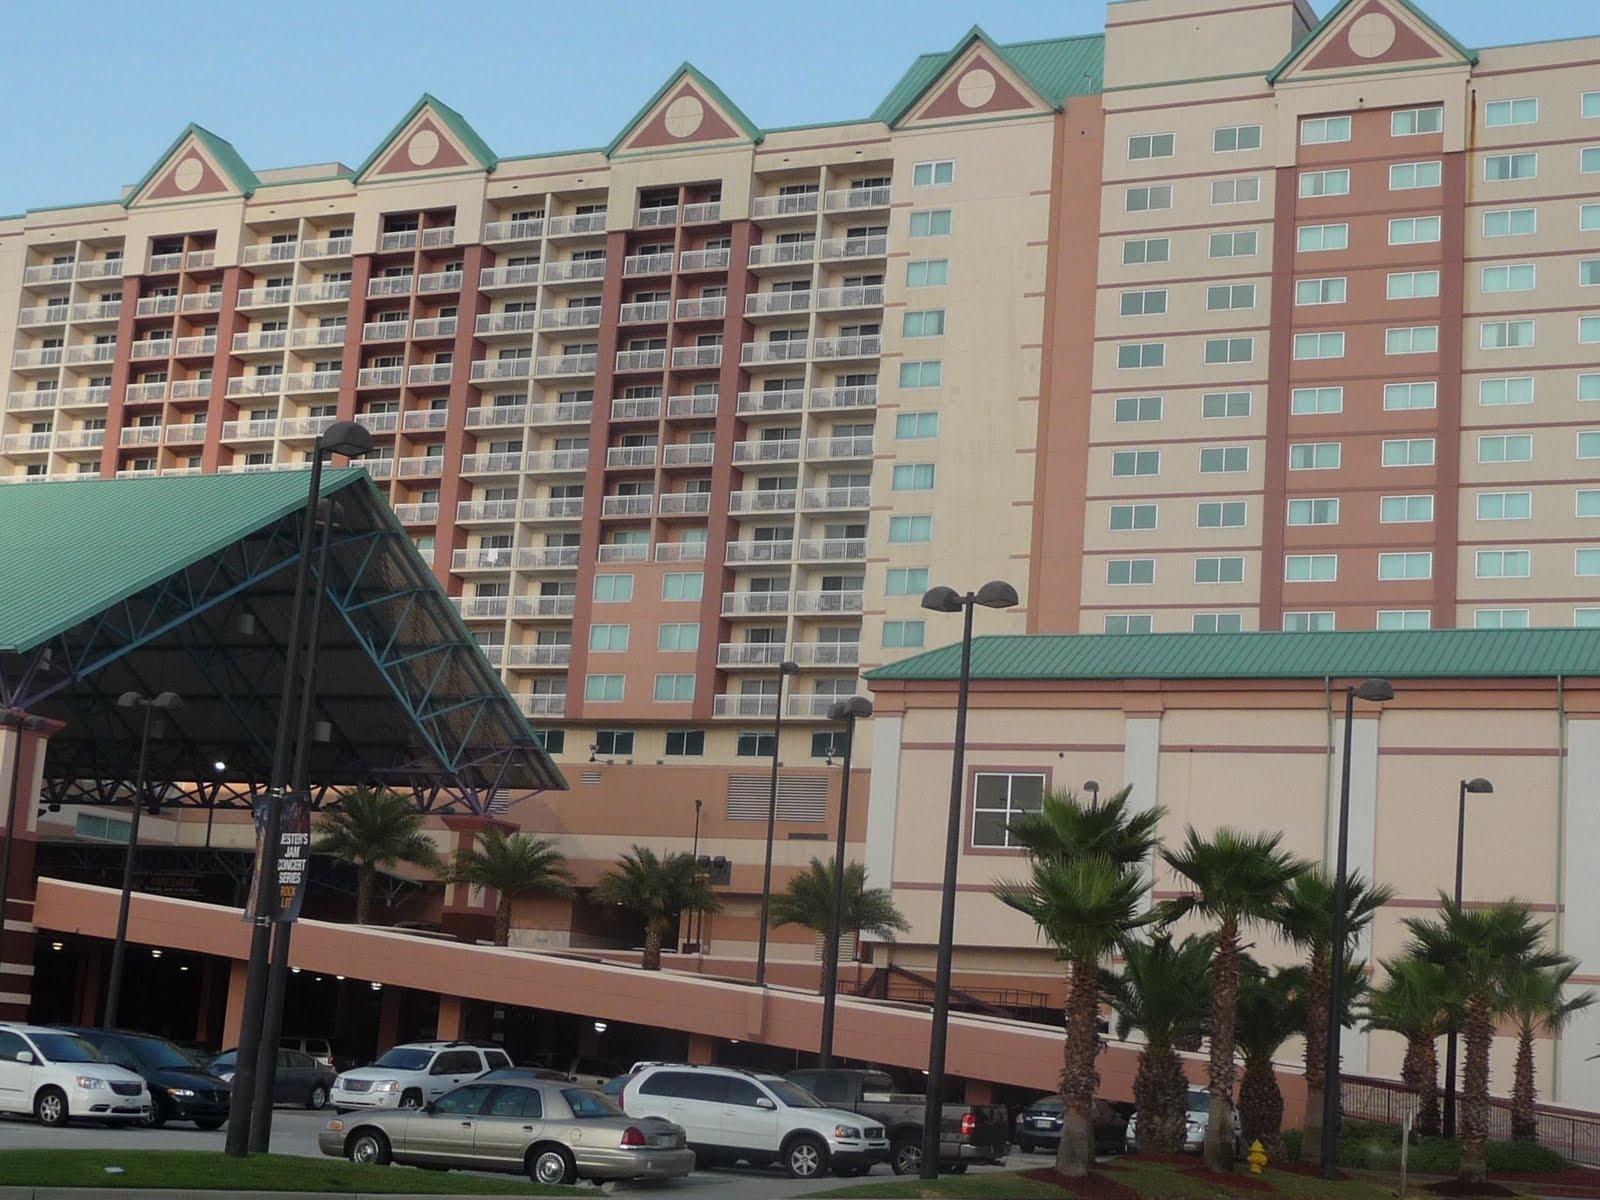 Isle casino biloxi